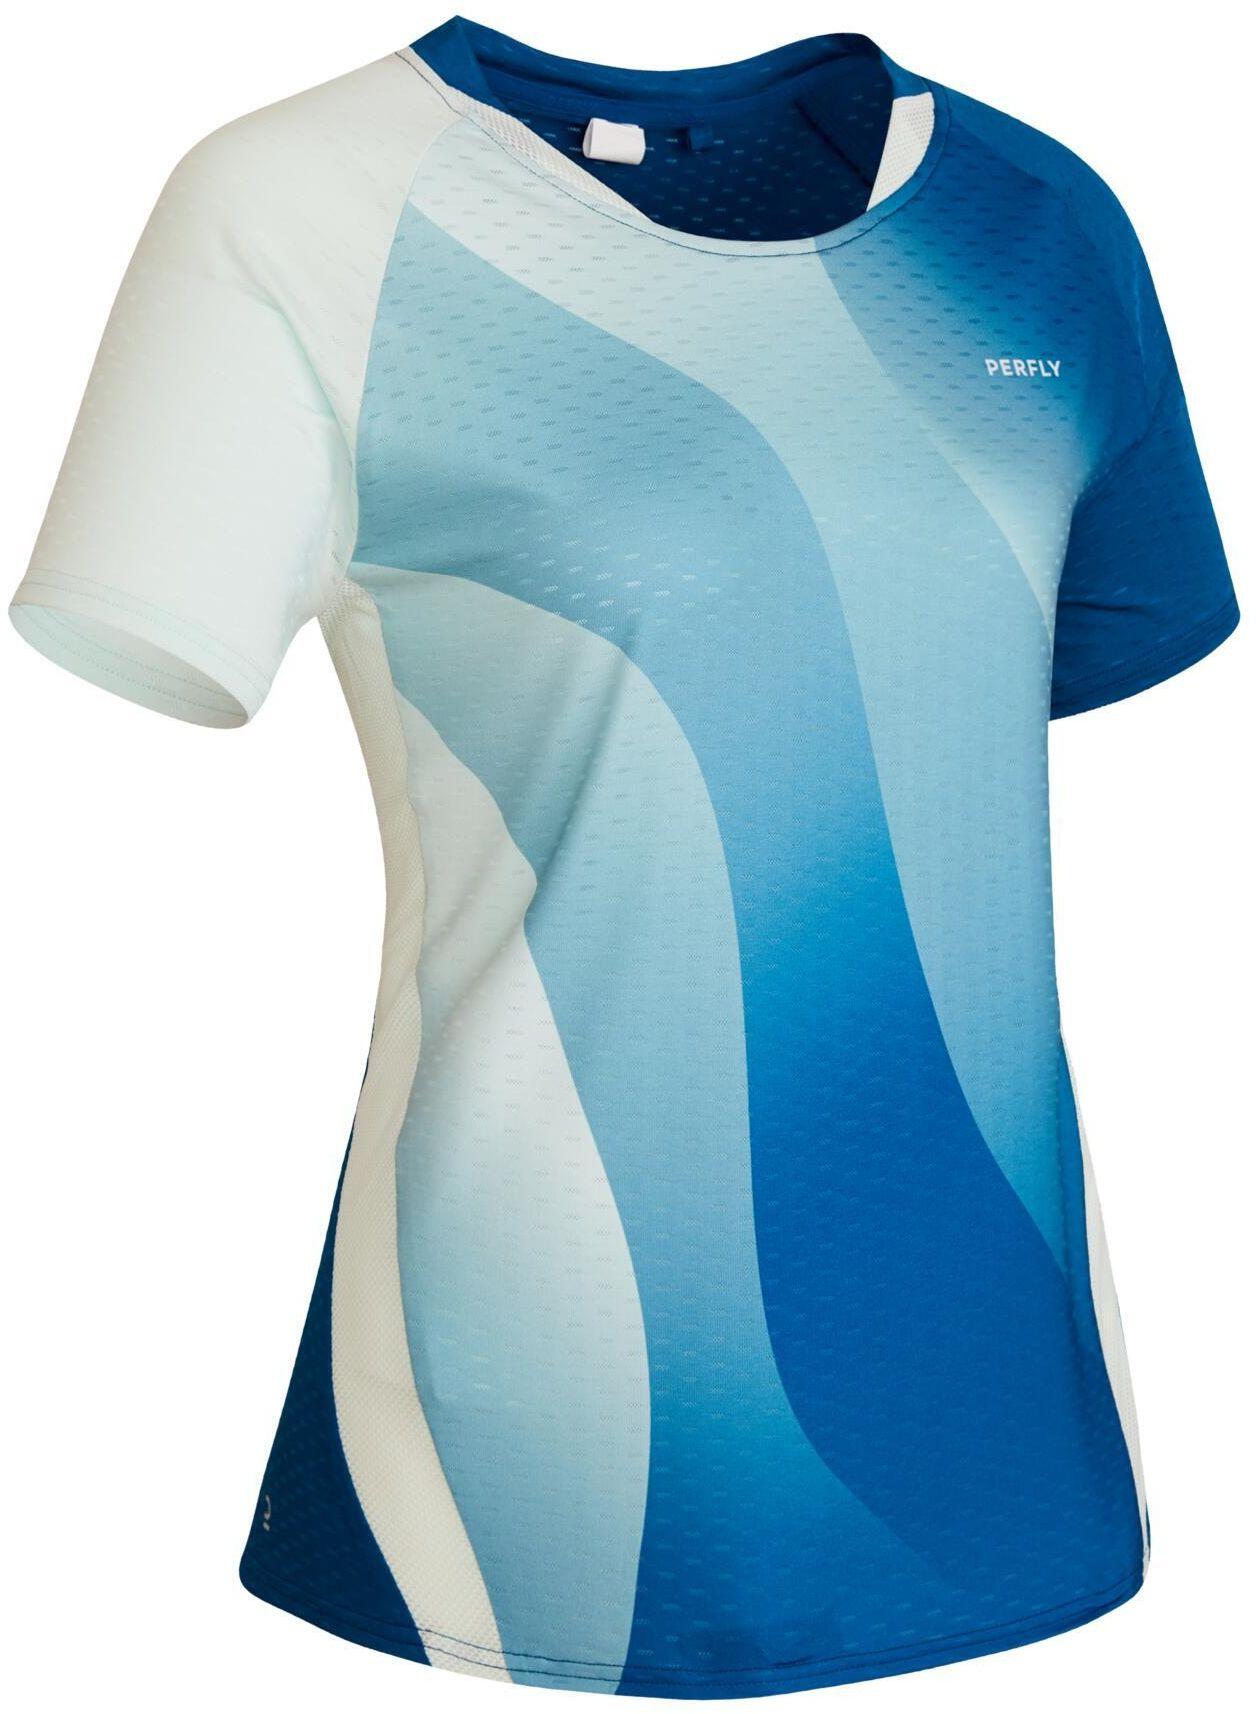 Koszulka do badmintona 560 damska